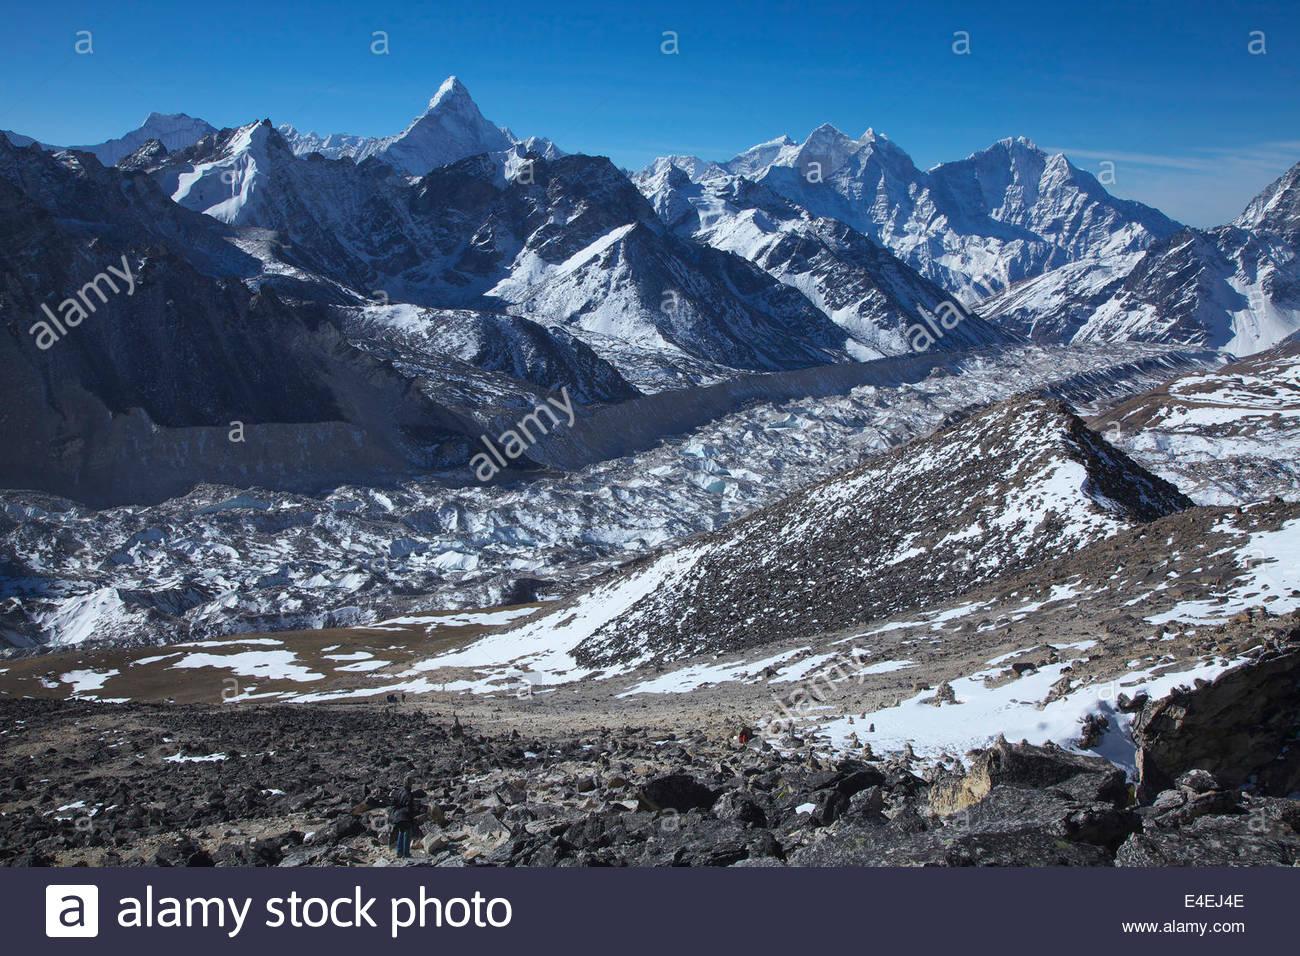 view mount everest mountain range khumbu glacier kala patthar stock photo royalty free image